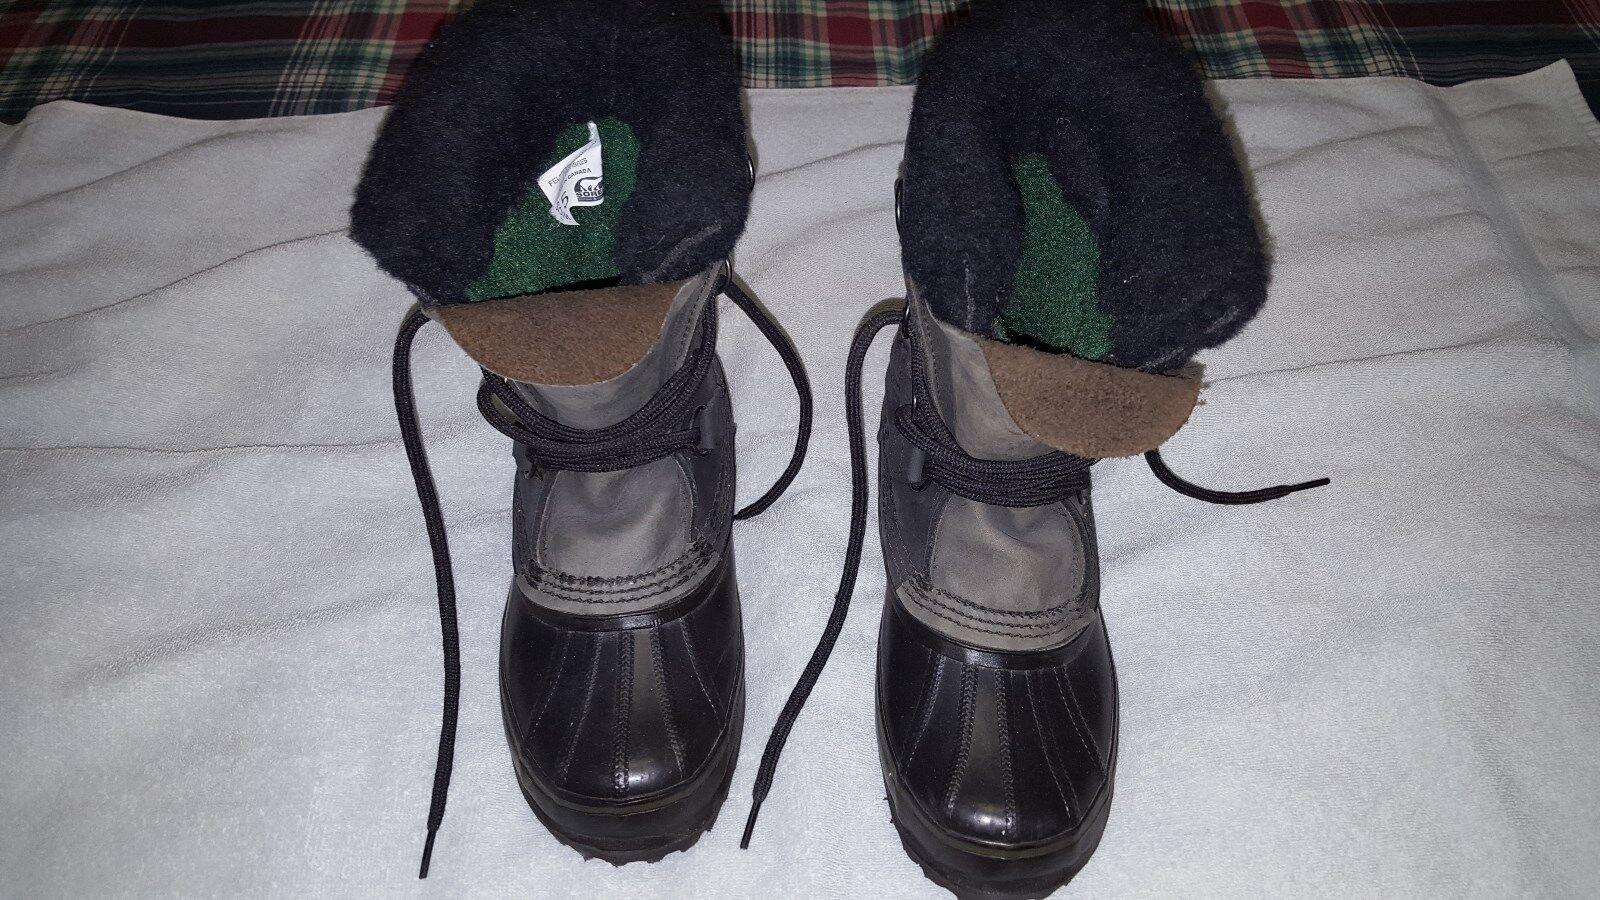 Sorel Para Mujer 5 Winter Lace Vibram Botas Negro Vibram Lace Exclusivo Nuevo 50d135